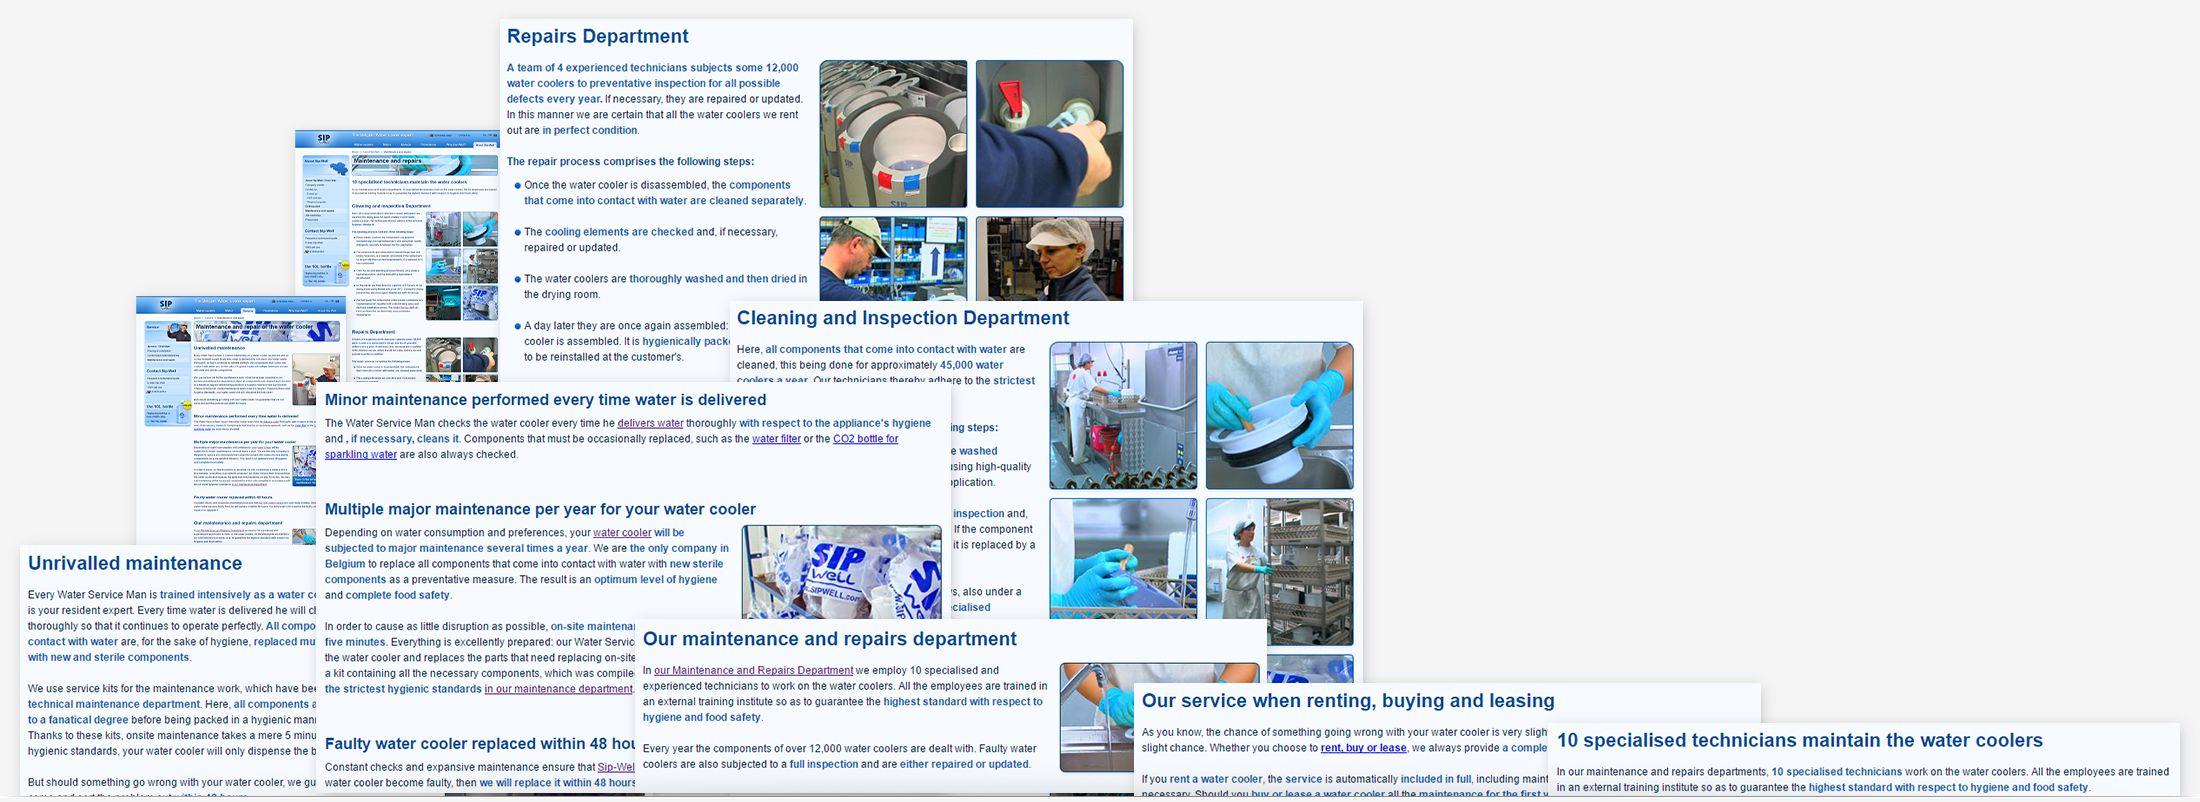 Sip-Well - maintenance & repairs